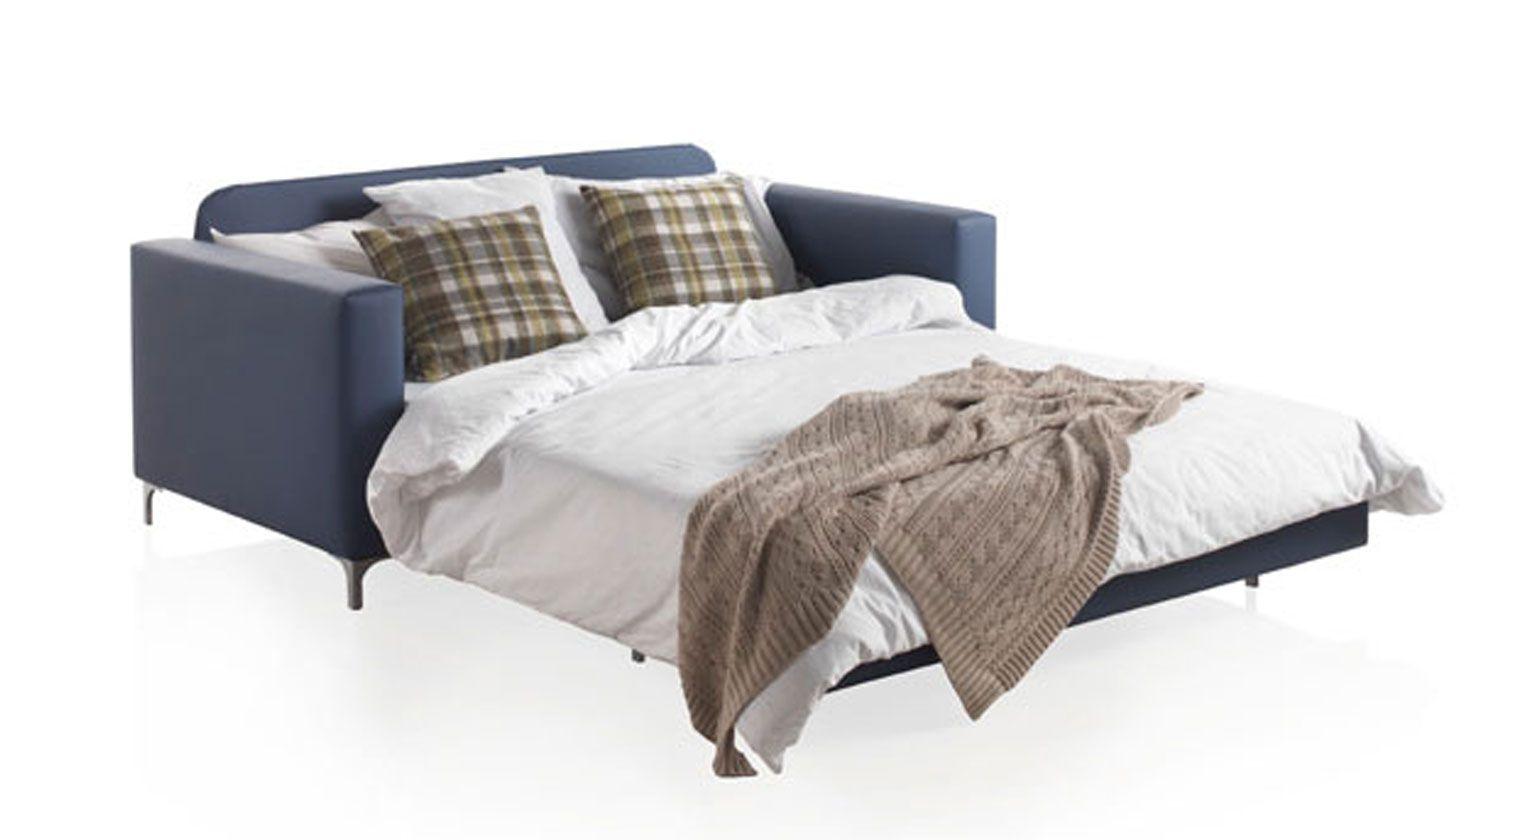 sofa camas baratos madrid